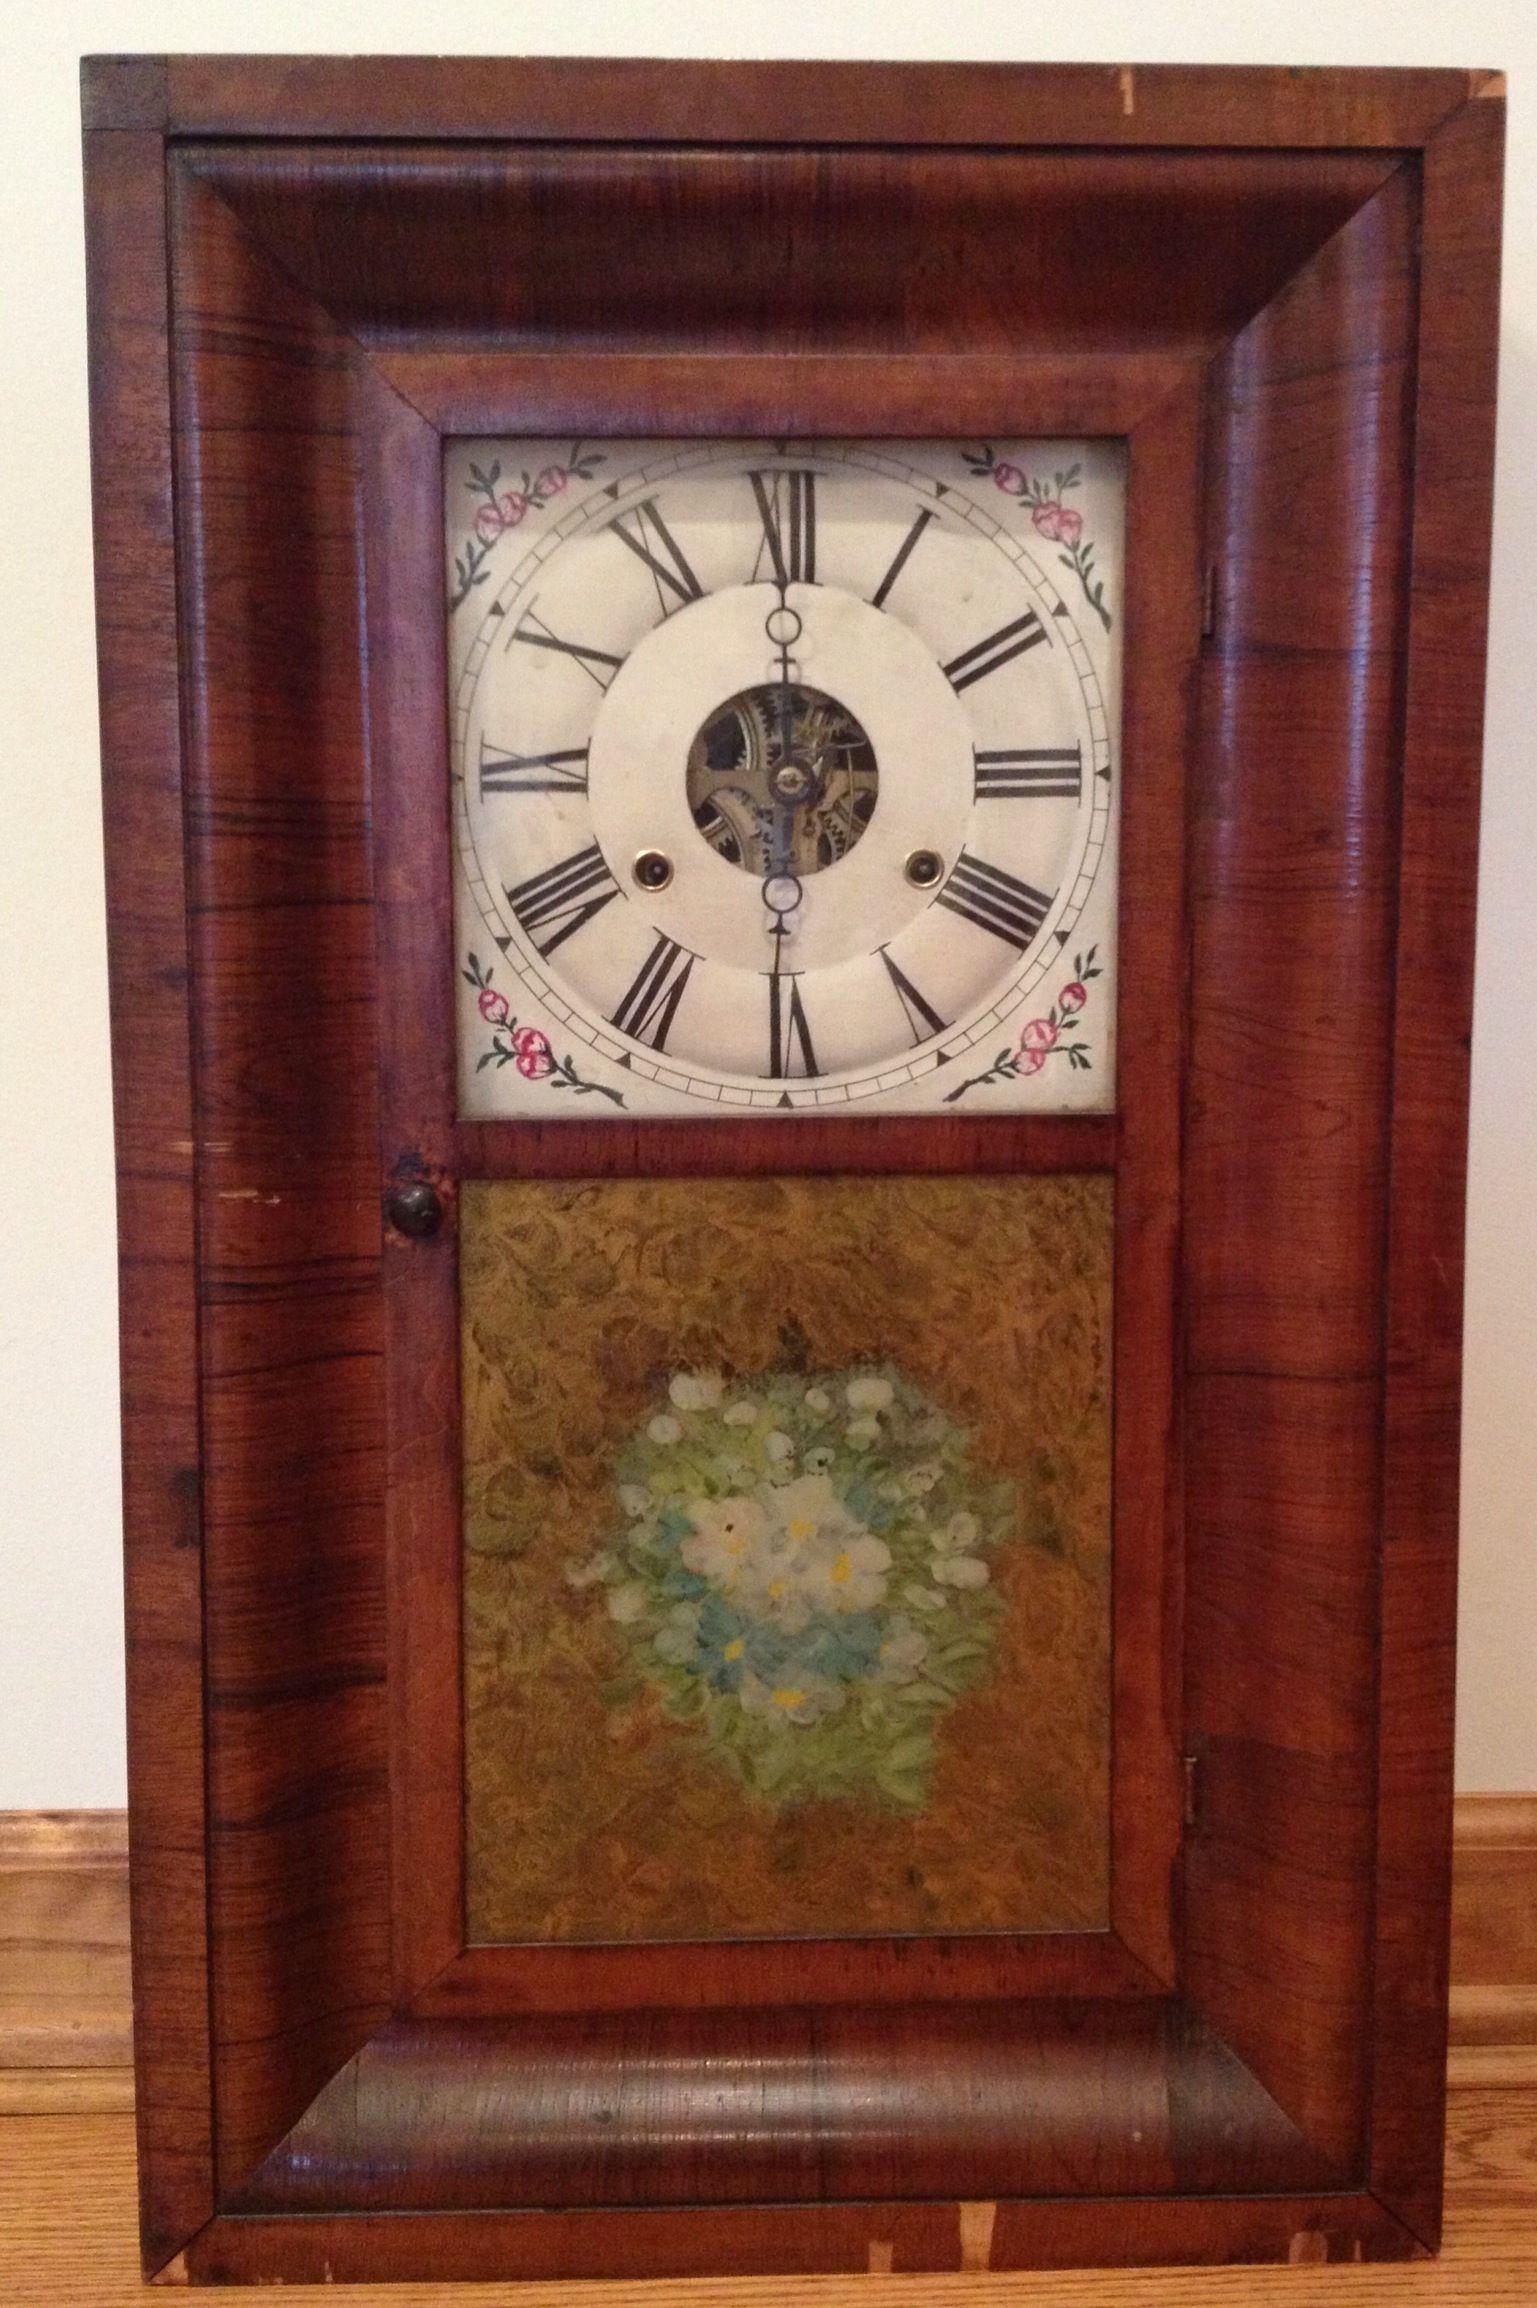 Arts and crafts mantle clock - Seth Thomas Ogee Mantel Clock Circa 1862 01 05 2013